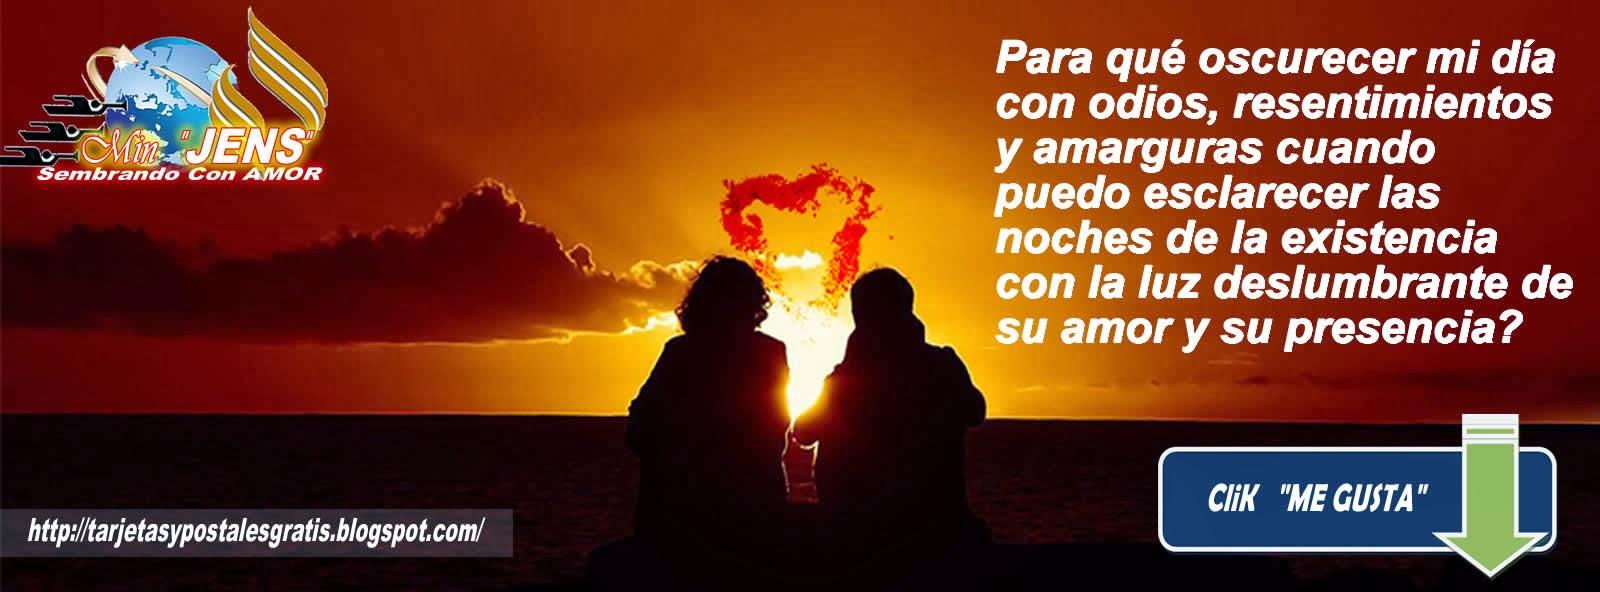 Imagenes De Frases De Amor Para Portada De Facebook Para Hombres